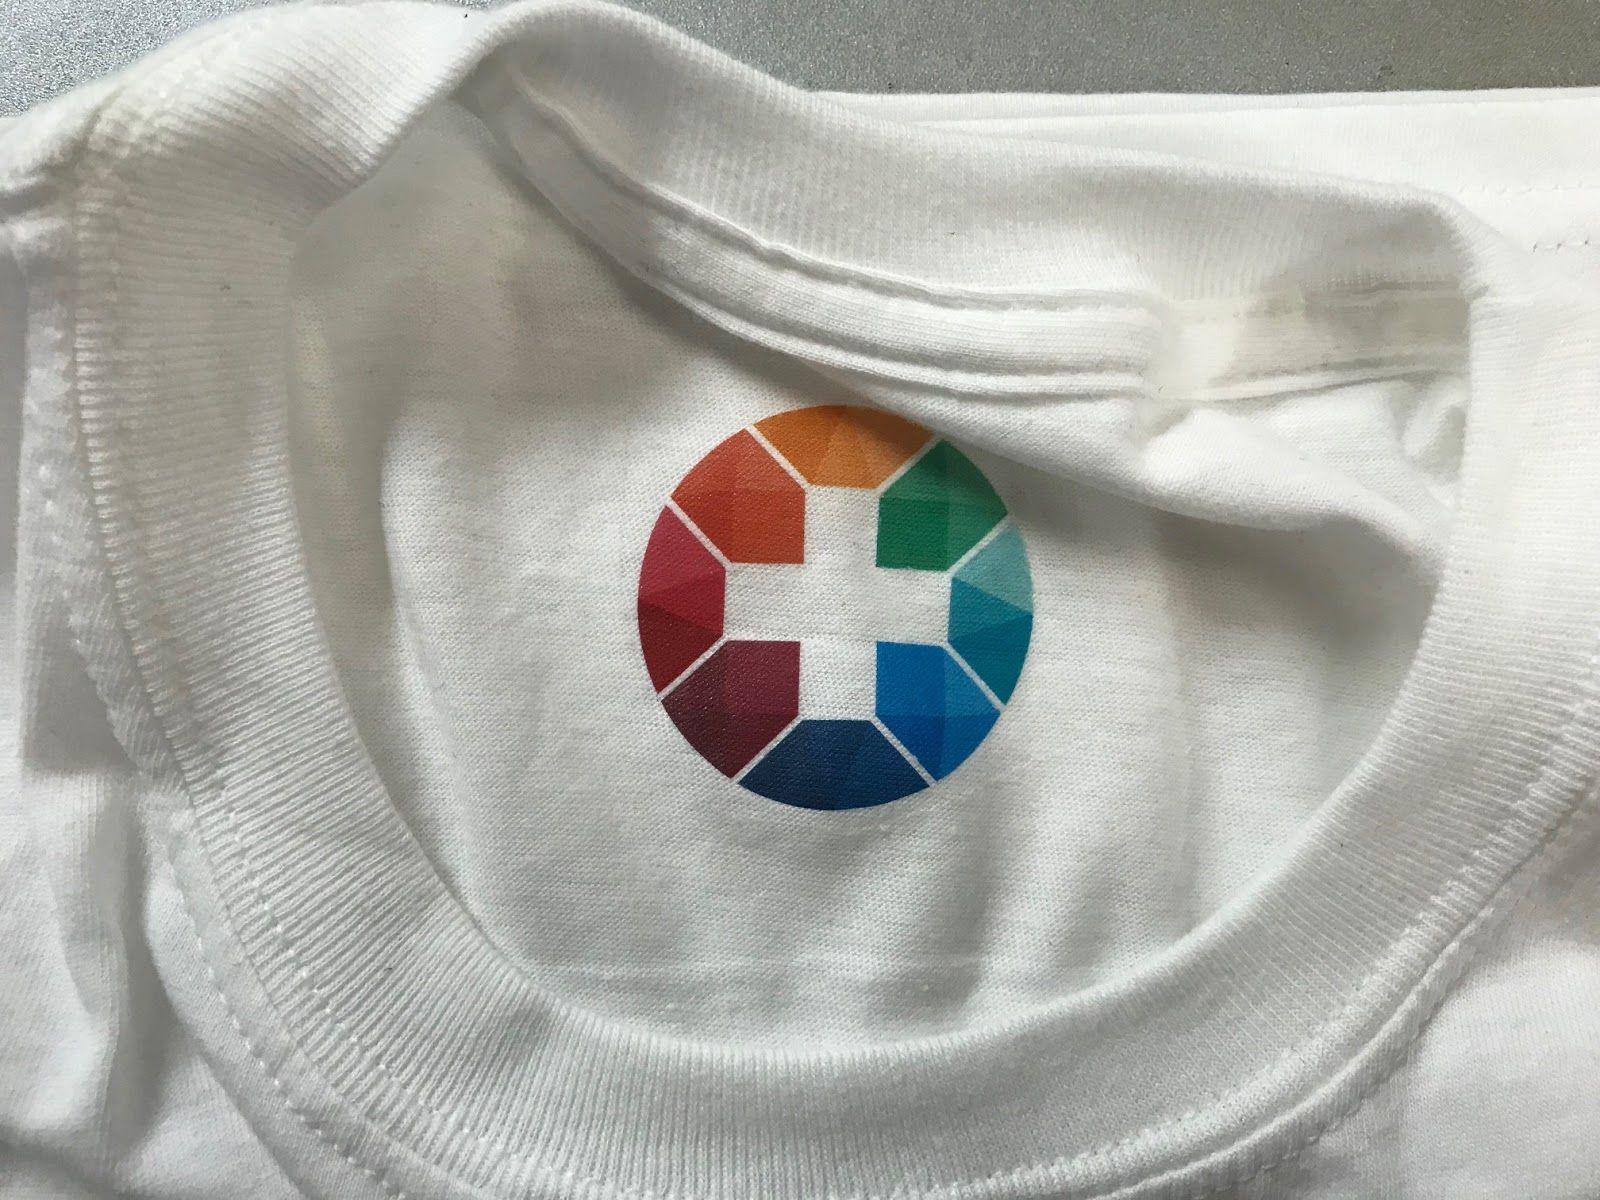 Colour print on white cotton t-shirt